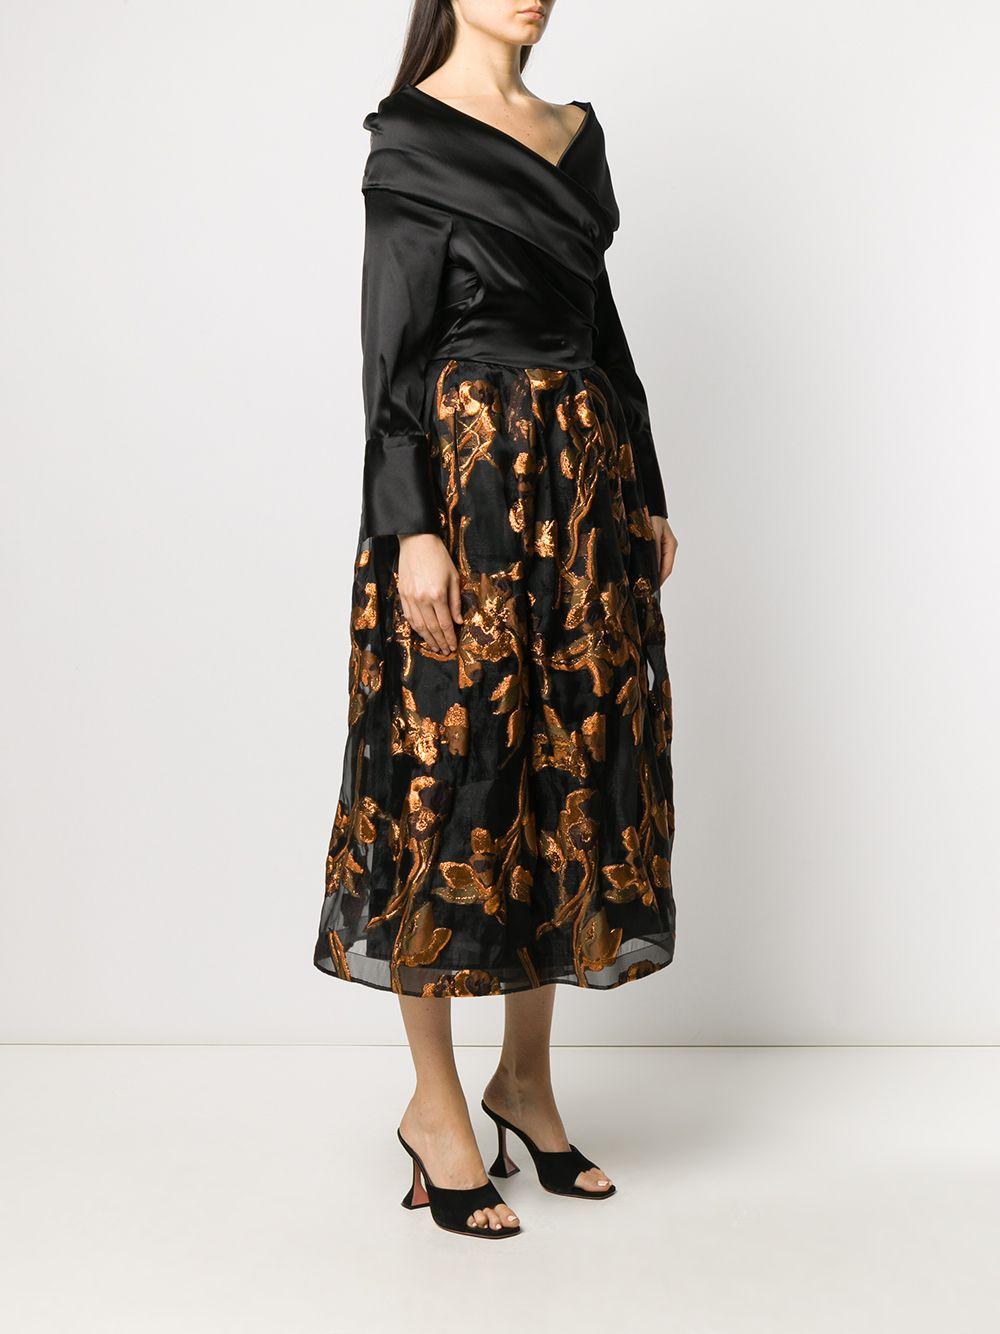 Black and brown silk-blend Zaki off-shoulder dress  SARA ROKA |  | ZAKI85 42-F2003A